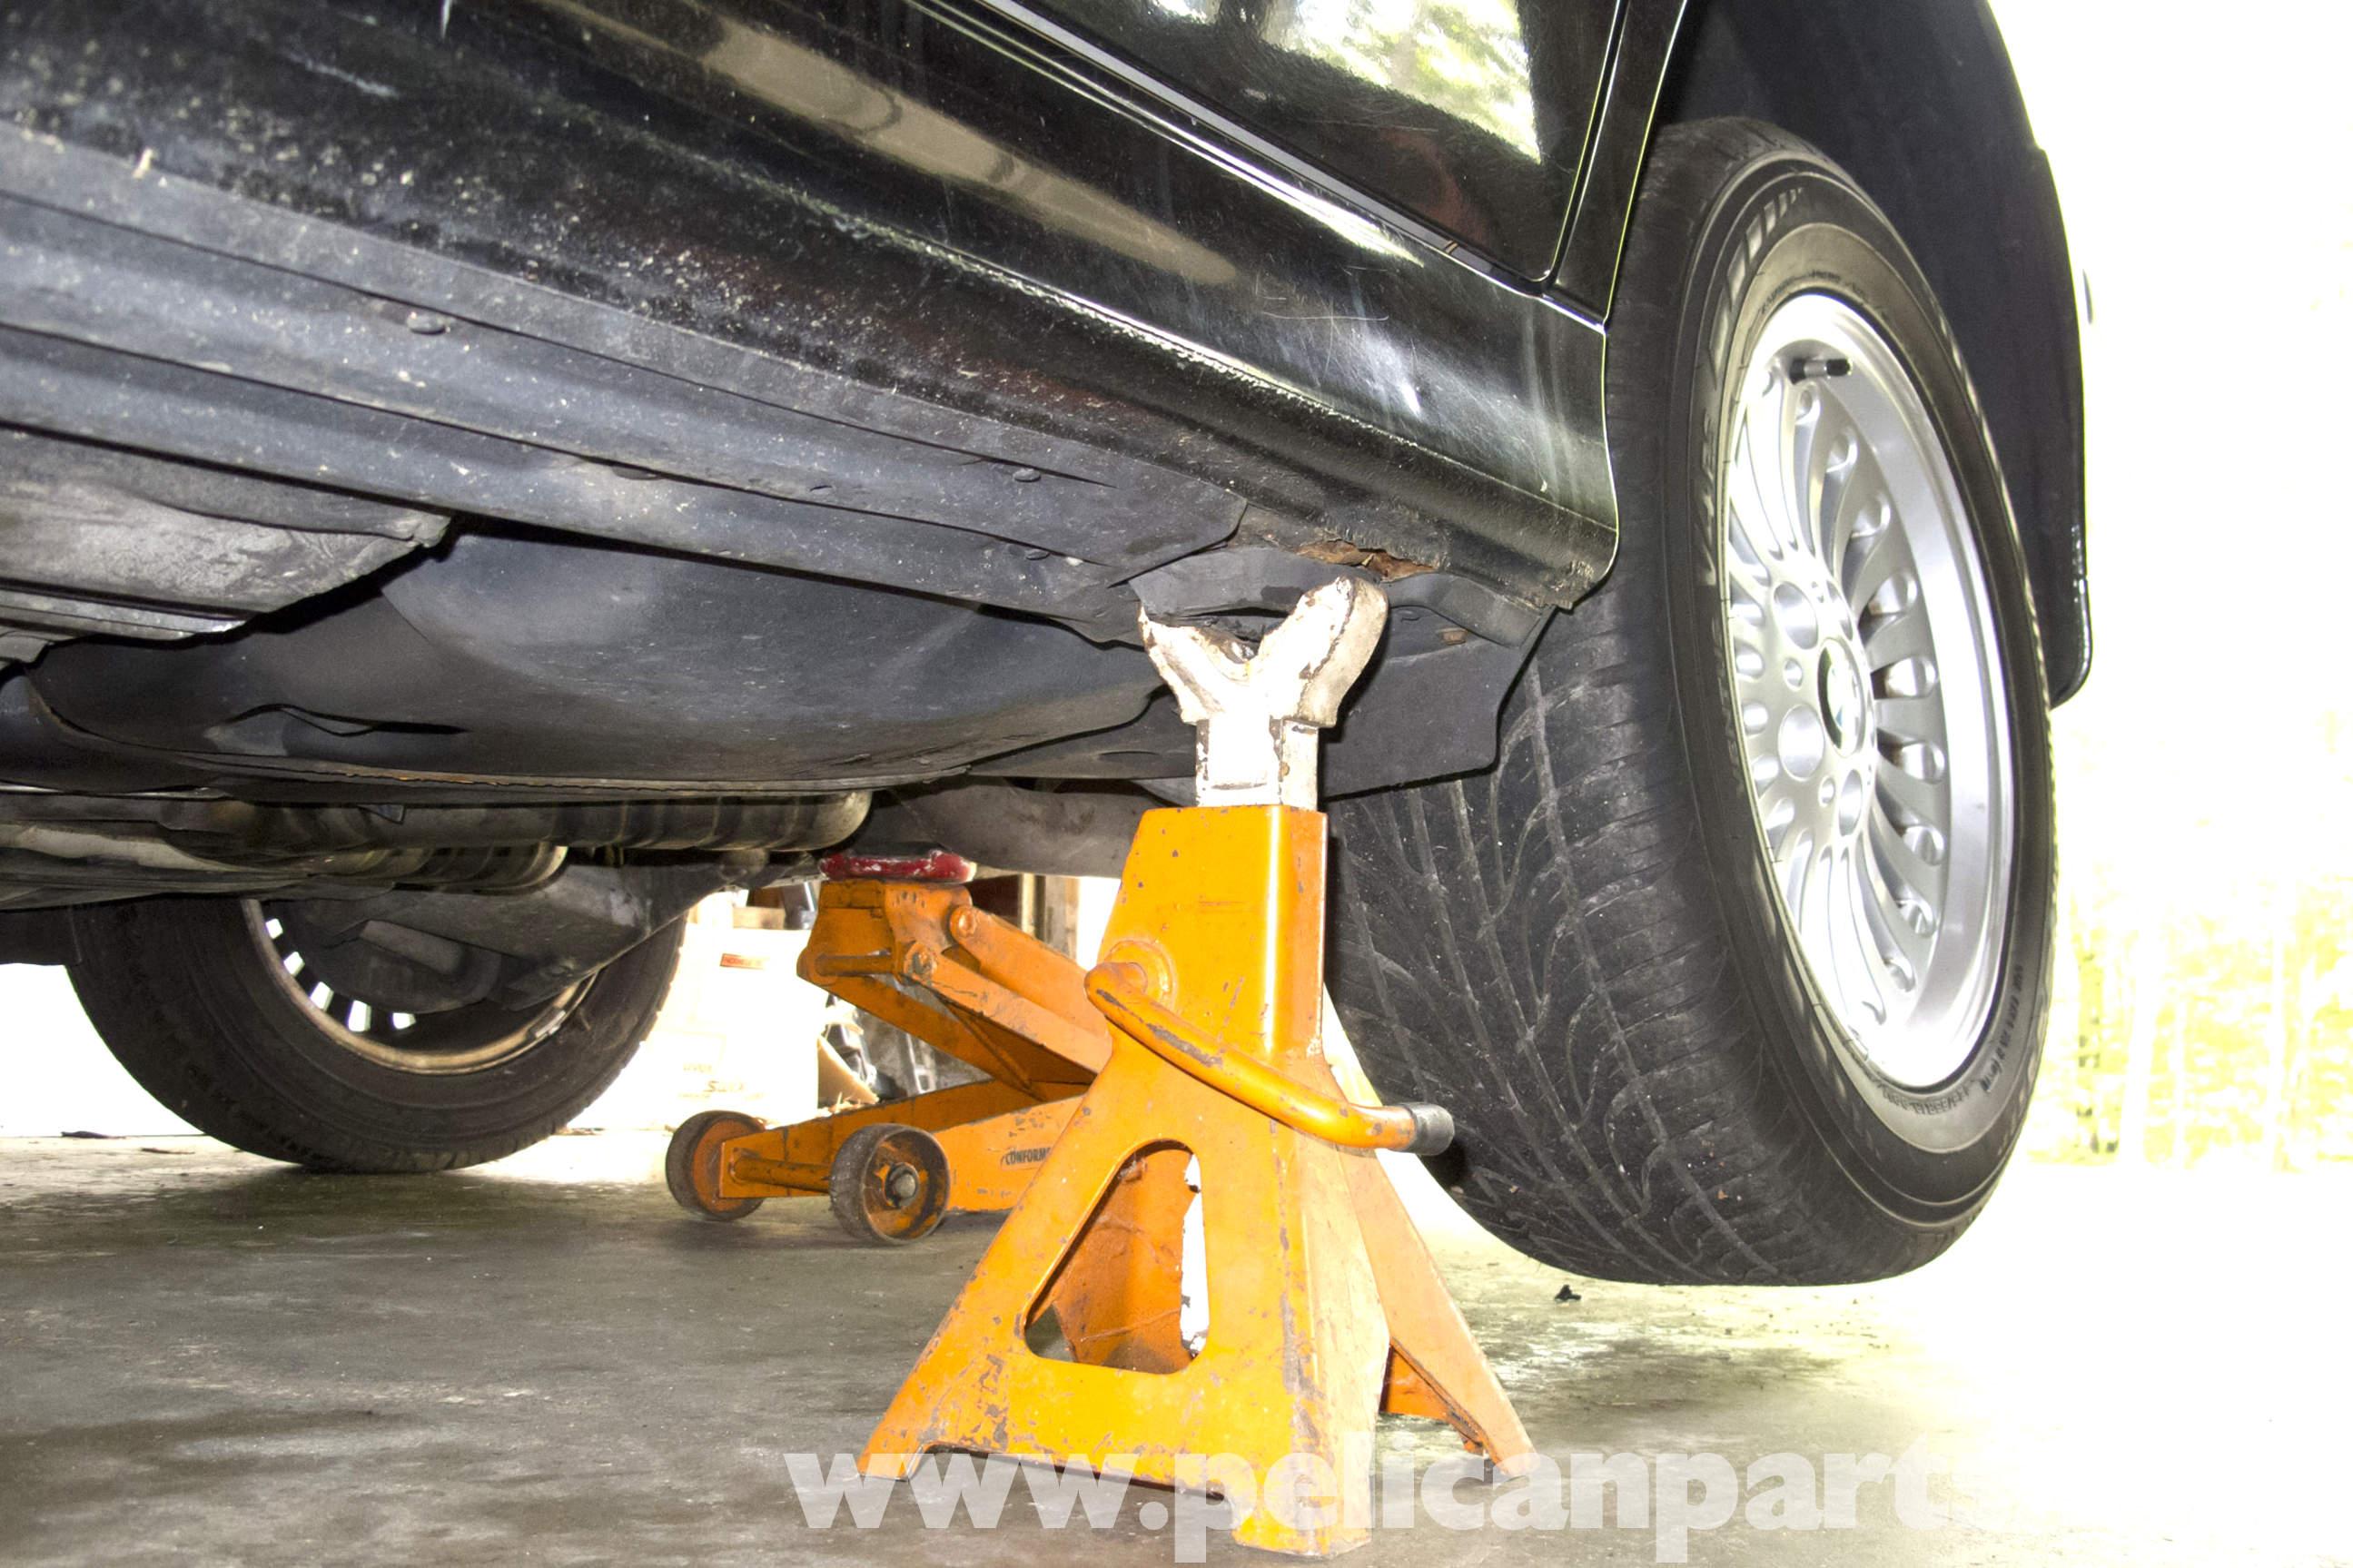 Bmw E39 5 Series Jacking Up Your Vehicle 1997 2003 525i 528i 530i 540i Pelican Parts Diy